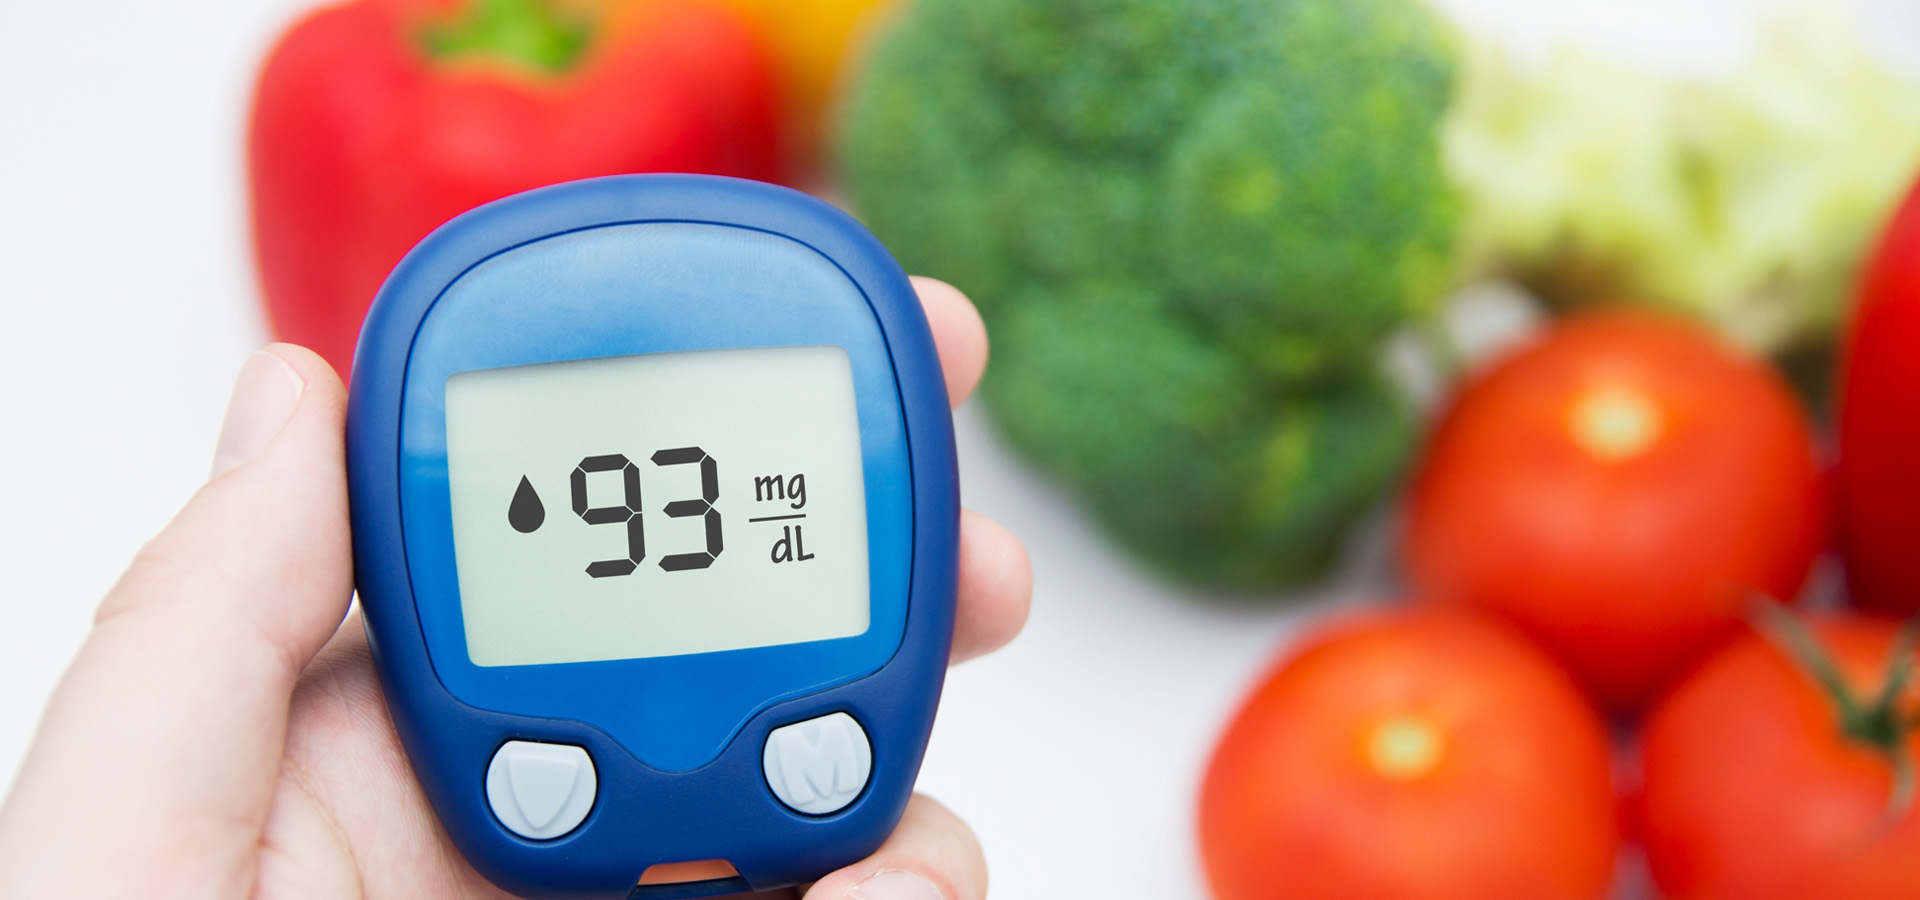 Endocrinologist & Diabetes Specialist - Dr  Eiriny Eskander